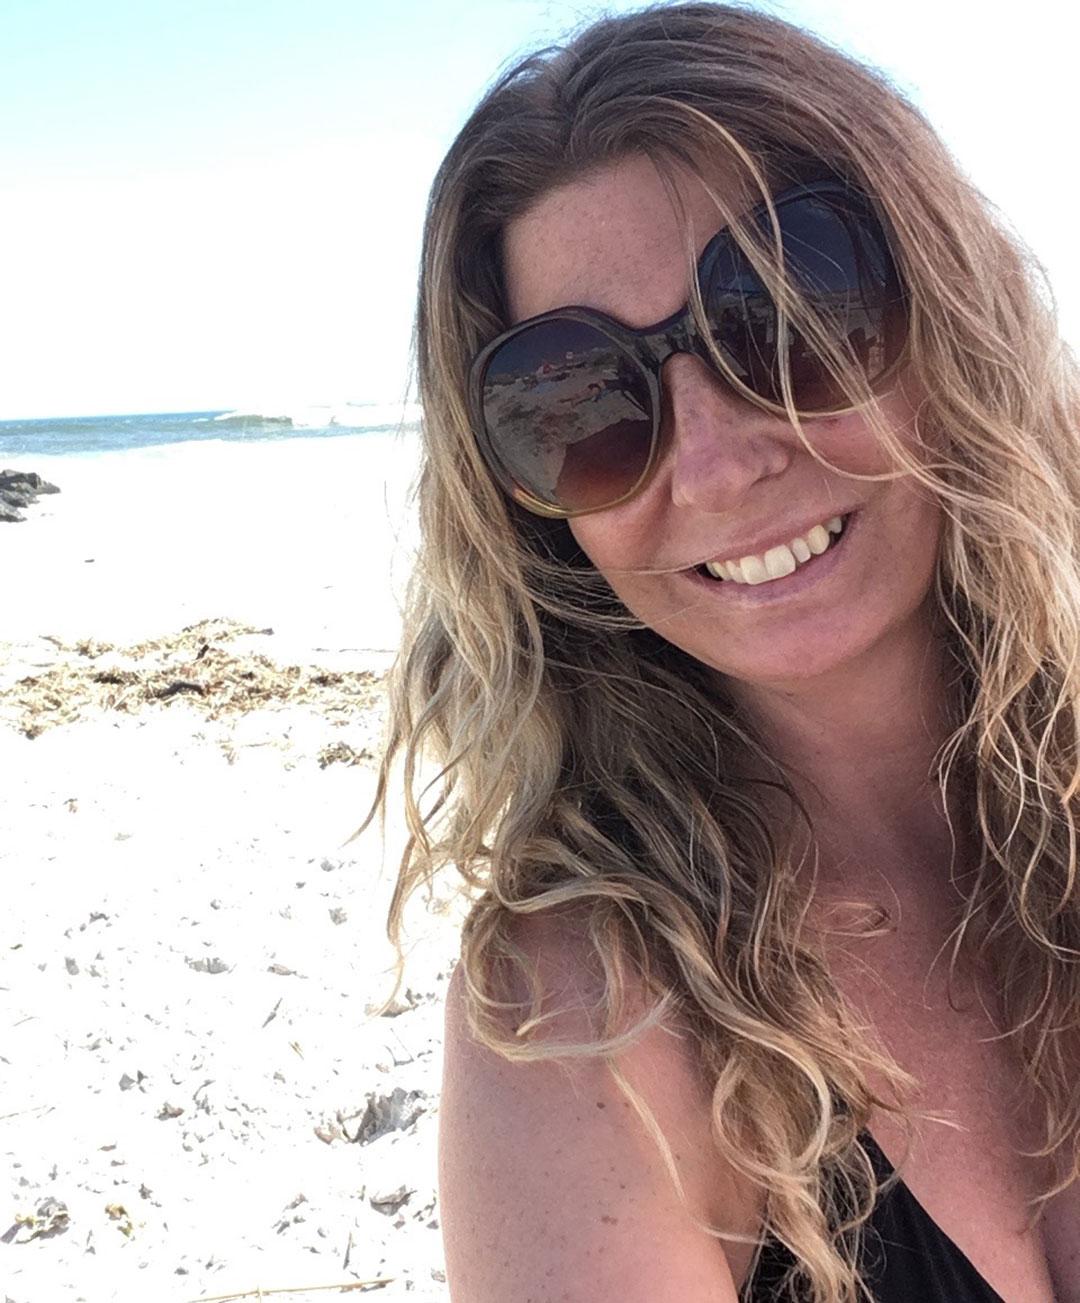 Une chevelure à la Beach Bum